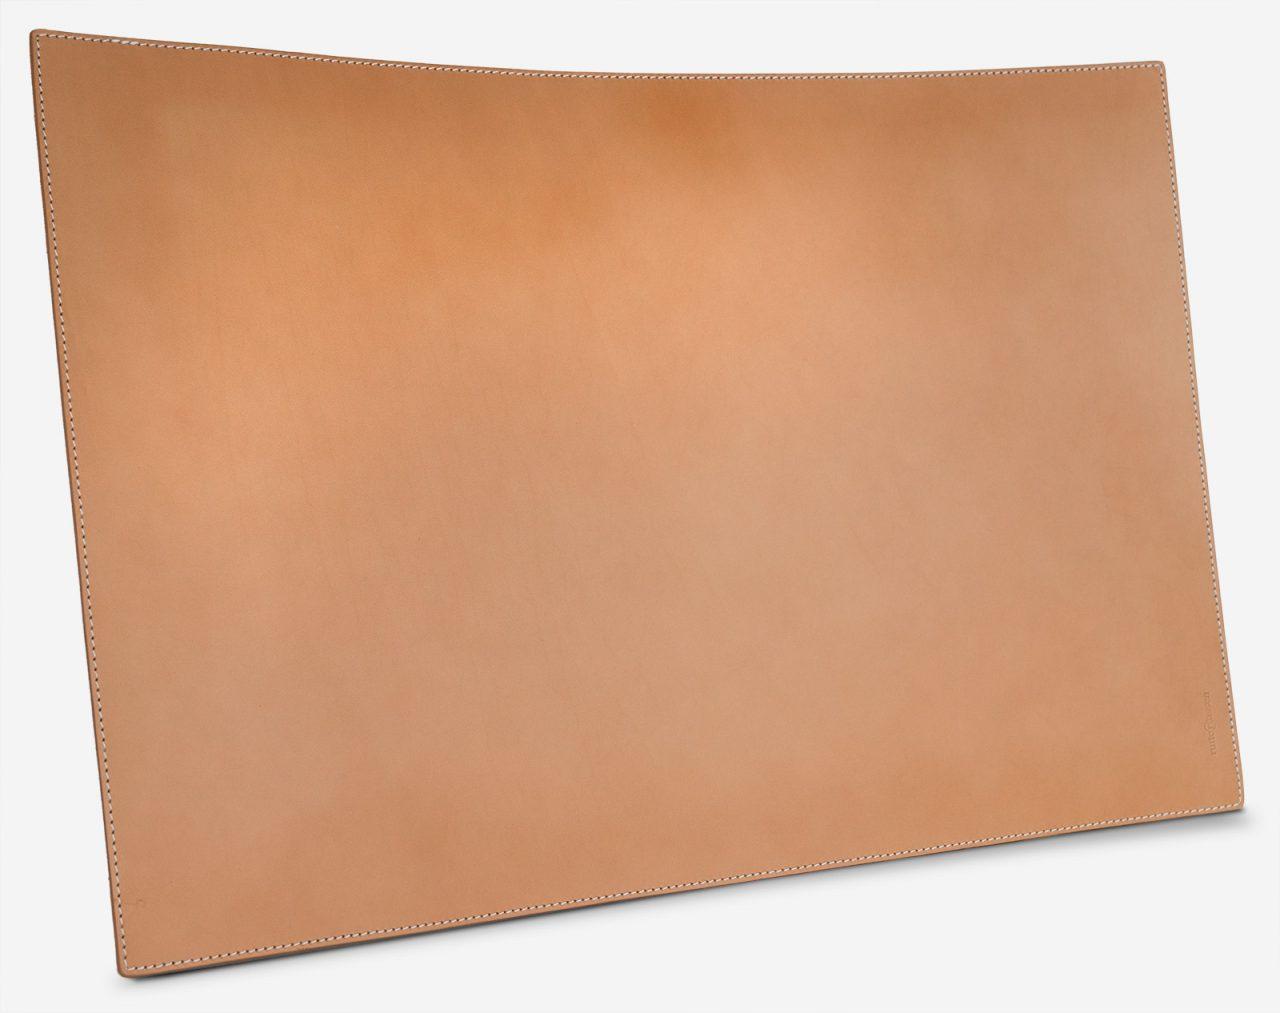 Tan leather writing mat.